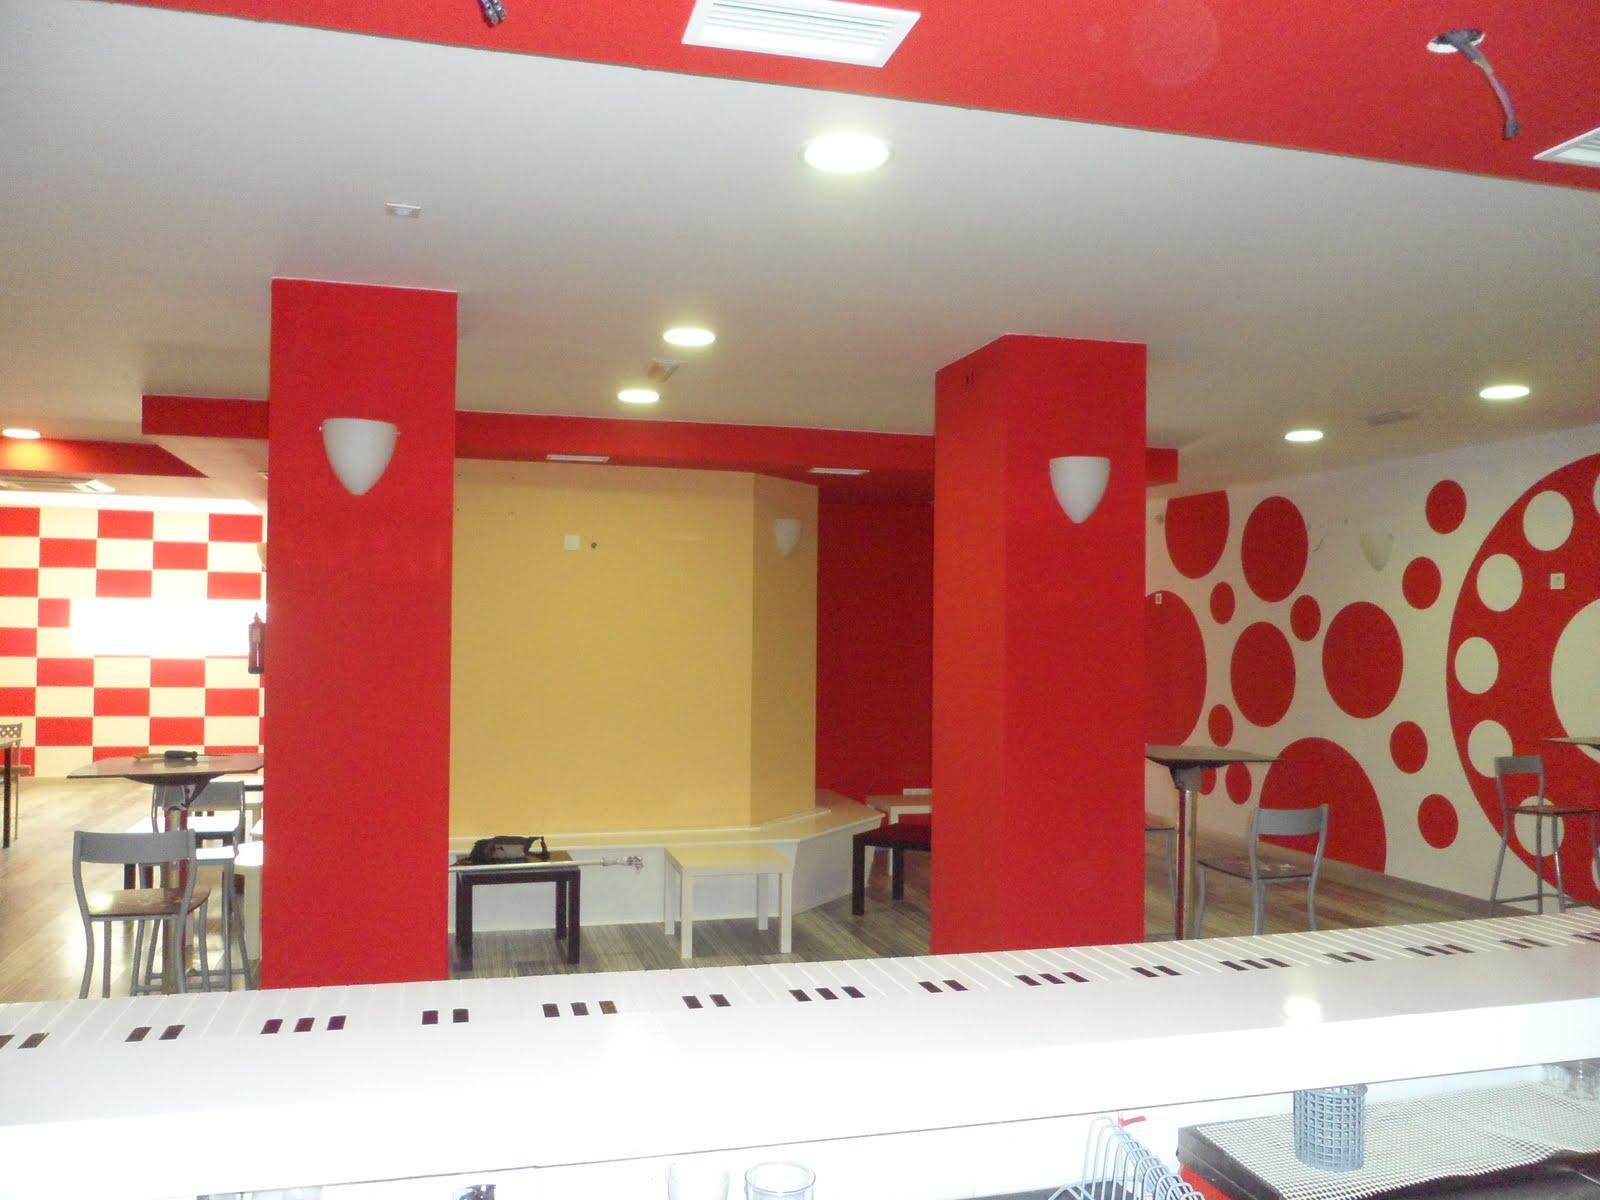 Murales art sticos decoraci n de caf bar for Decoracion cafeteria